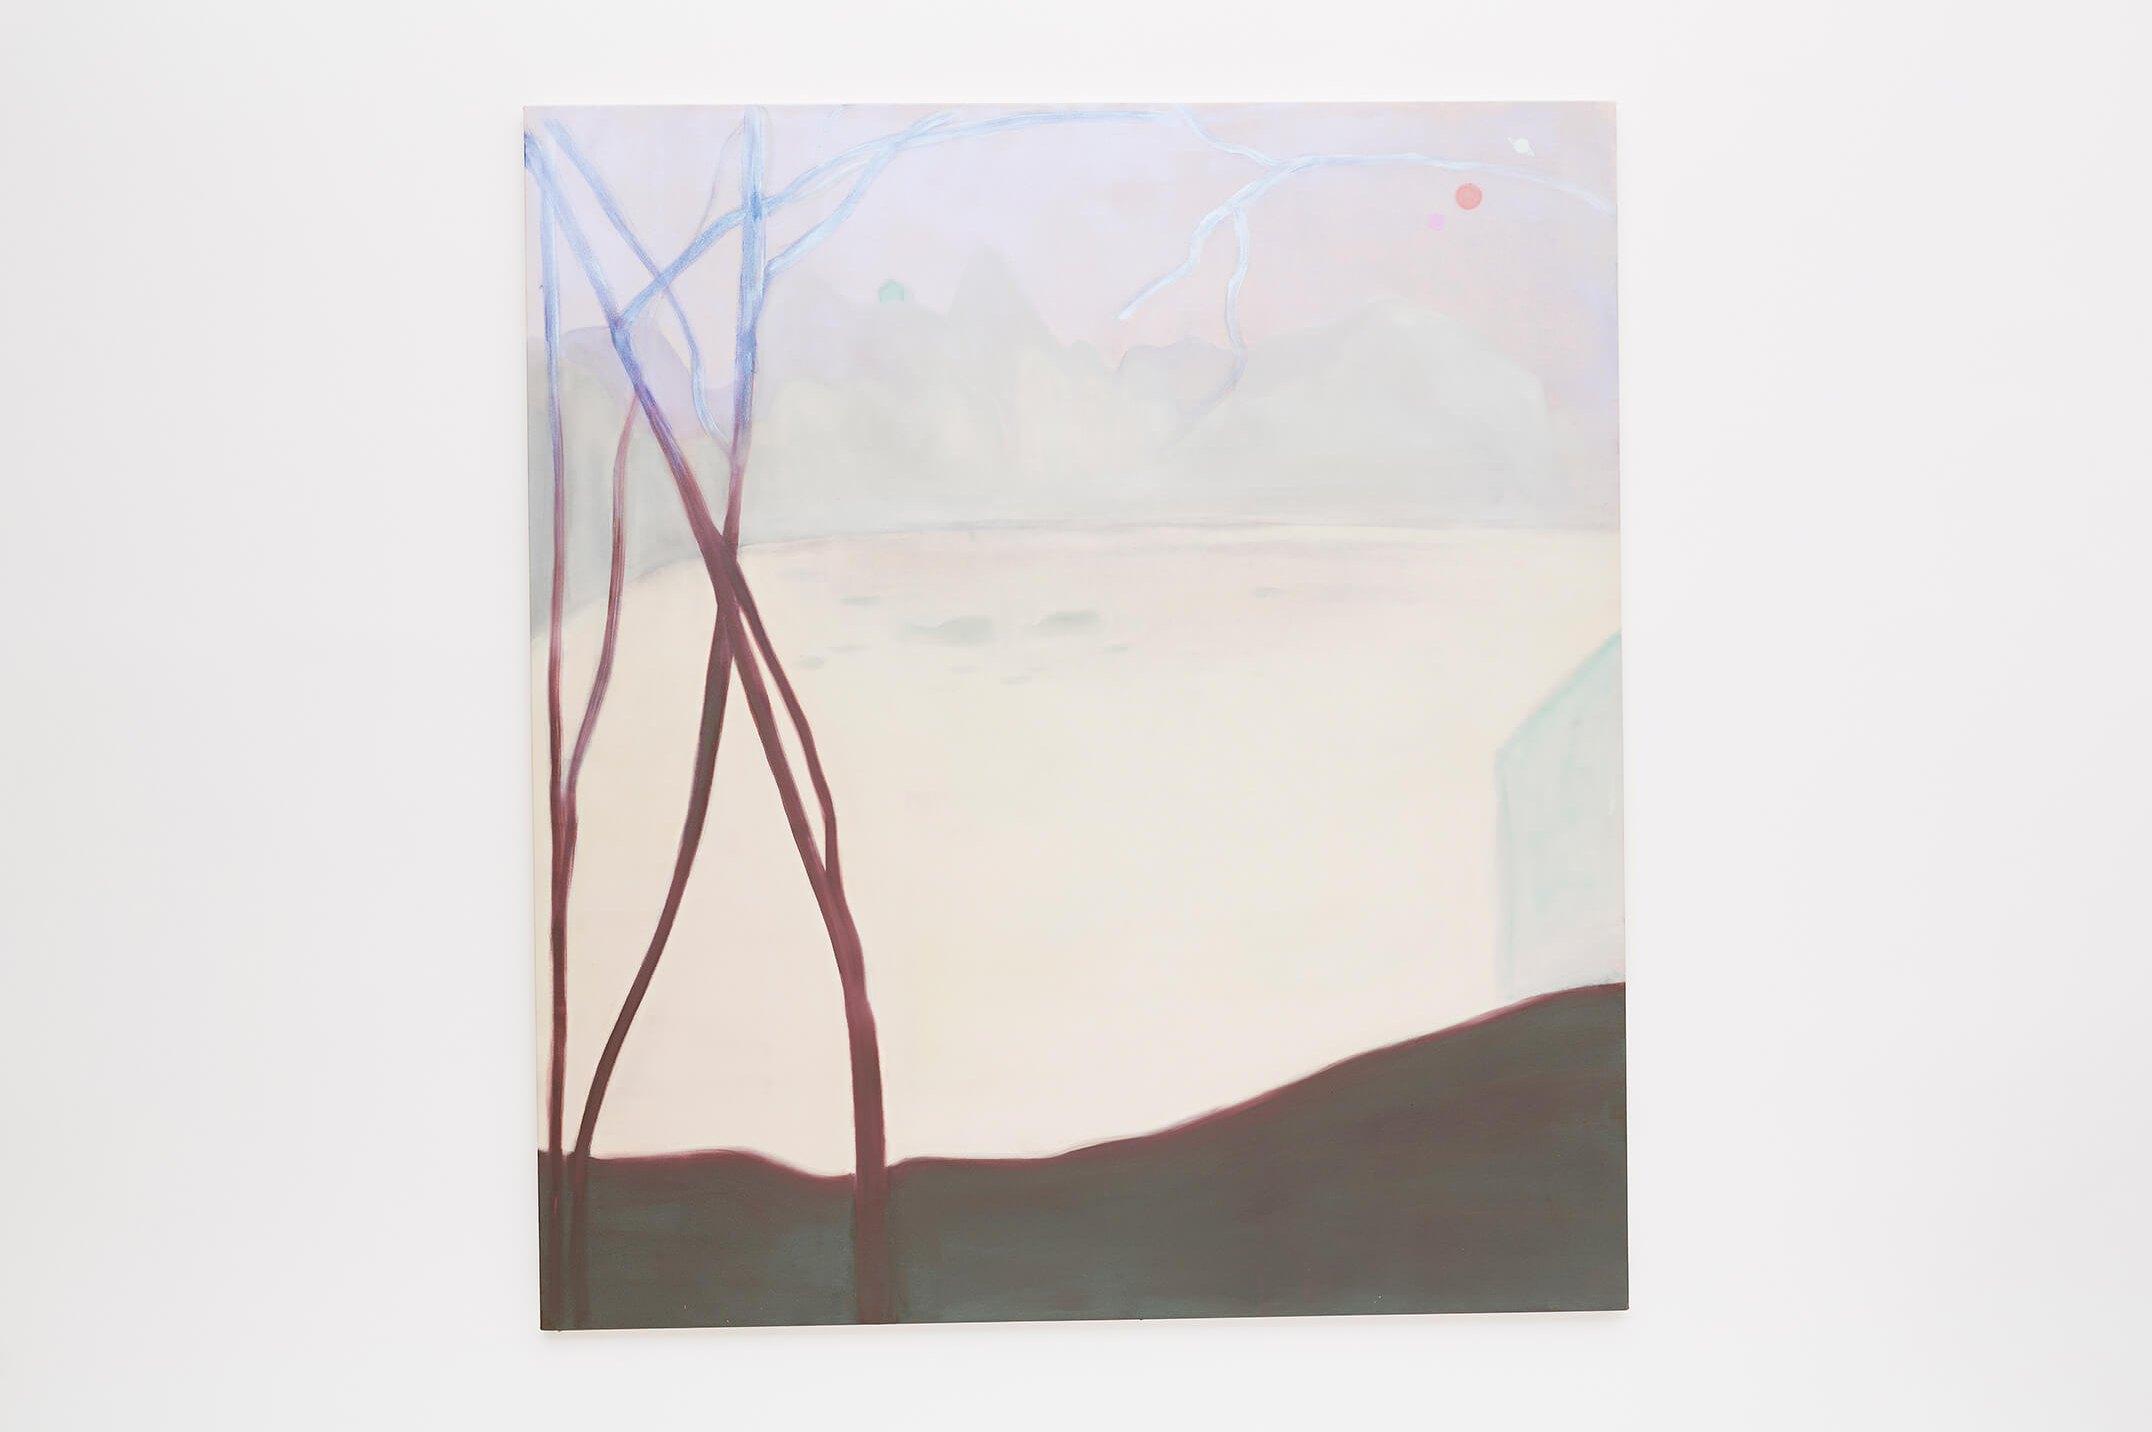 Marina Perez Simão,<em>untitled</em>,2015,oil and iridescent pigment on canvas, 190 × 170×3,5 cm - Mendes Wood DM